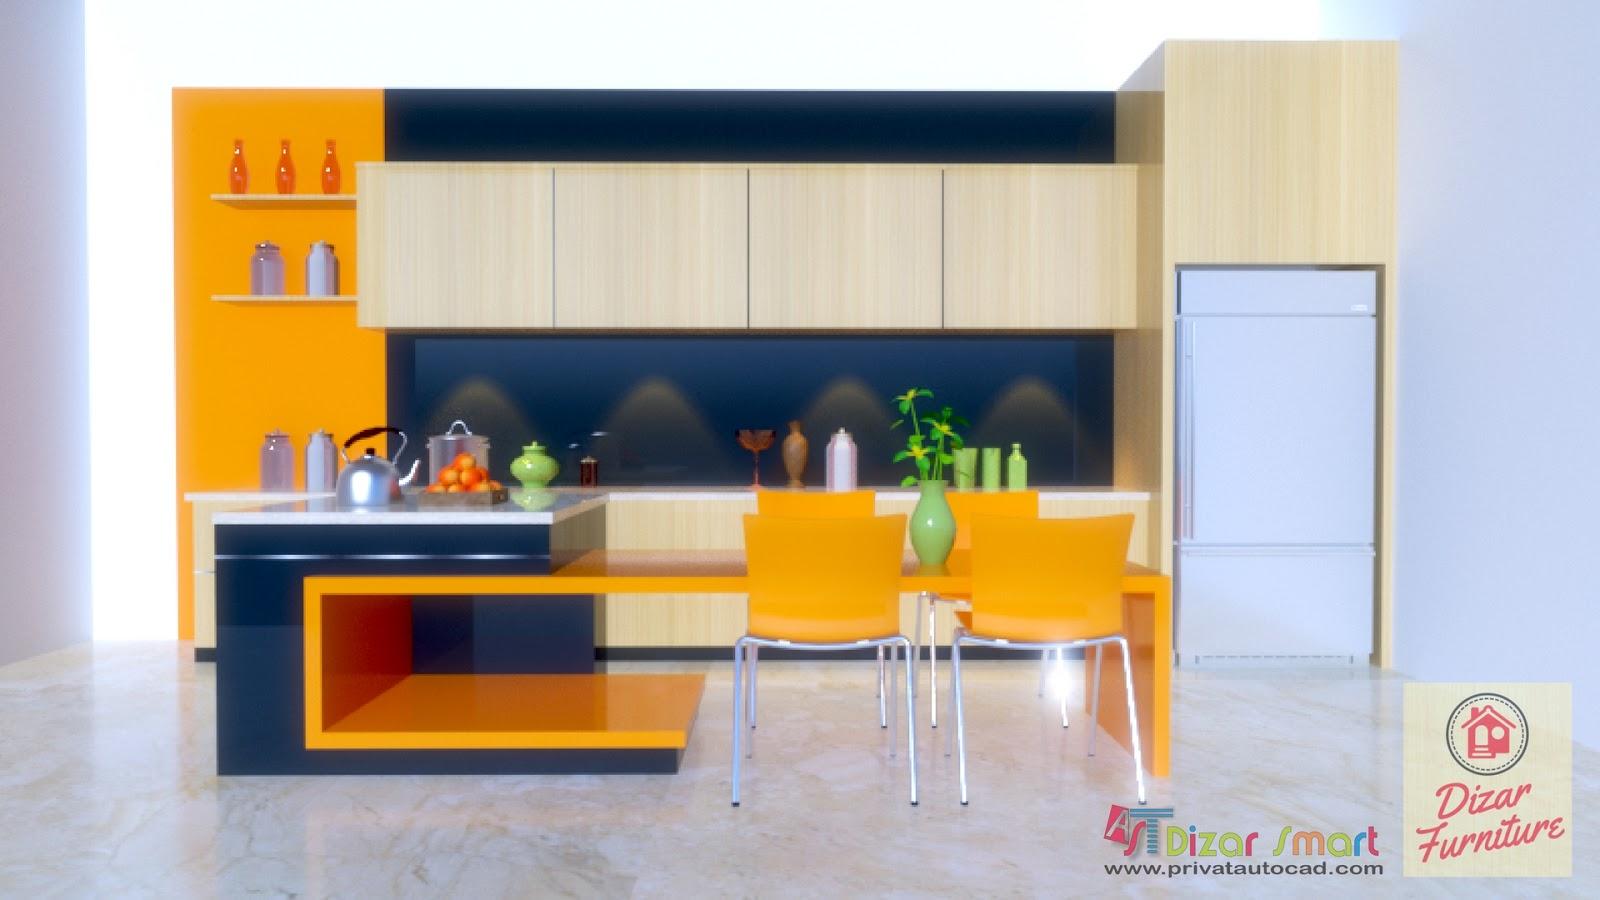 Dizar Smart Kitchen Set Minimlais Modern